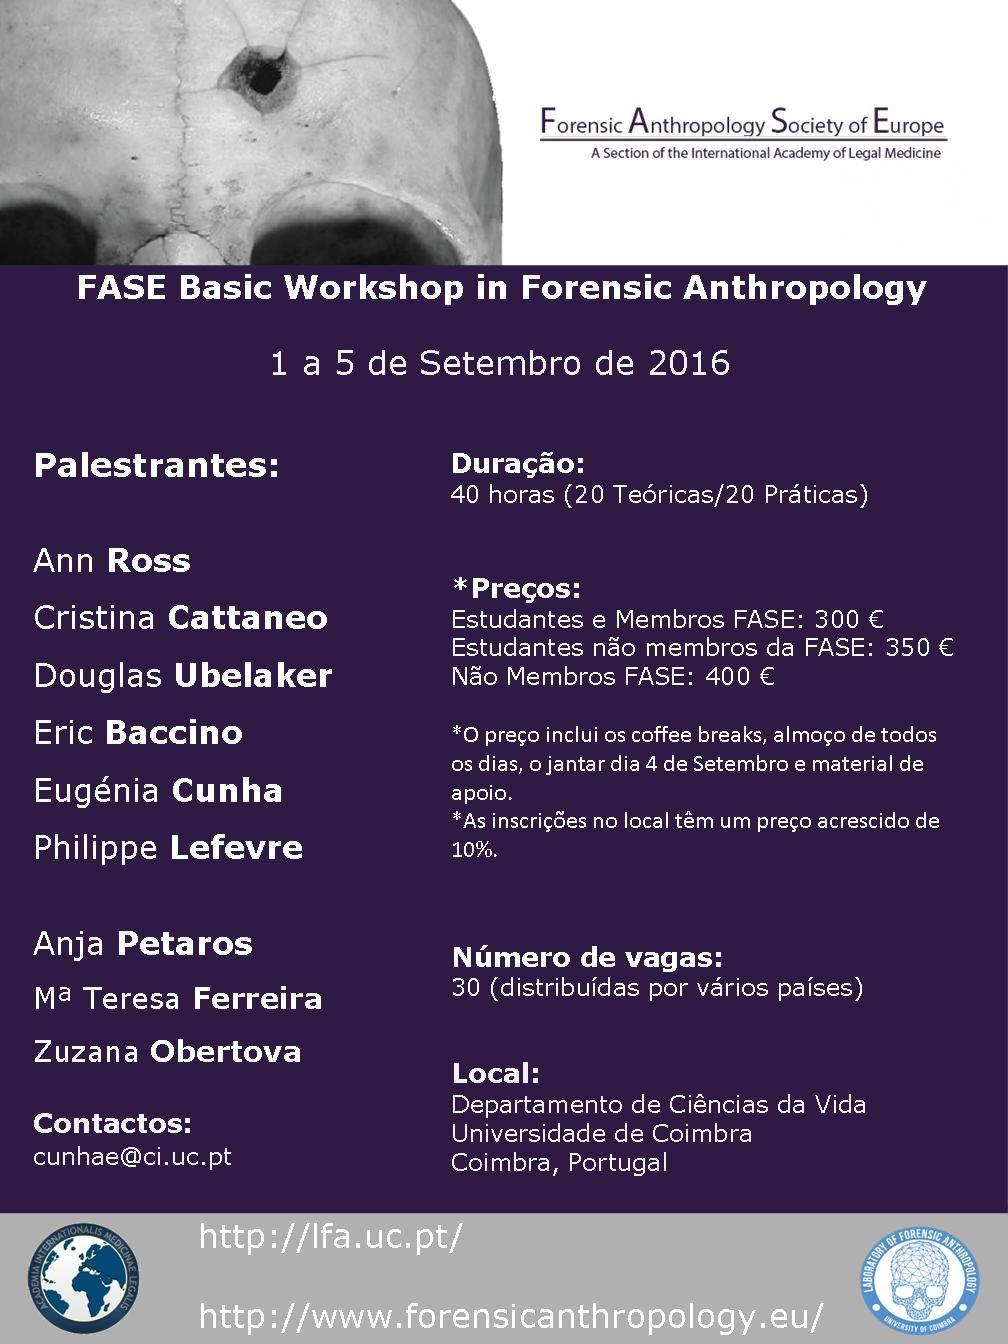 FASE Basic Workshop in Forensic Anthropology